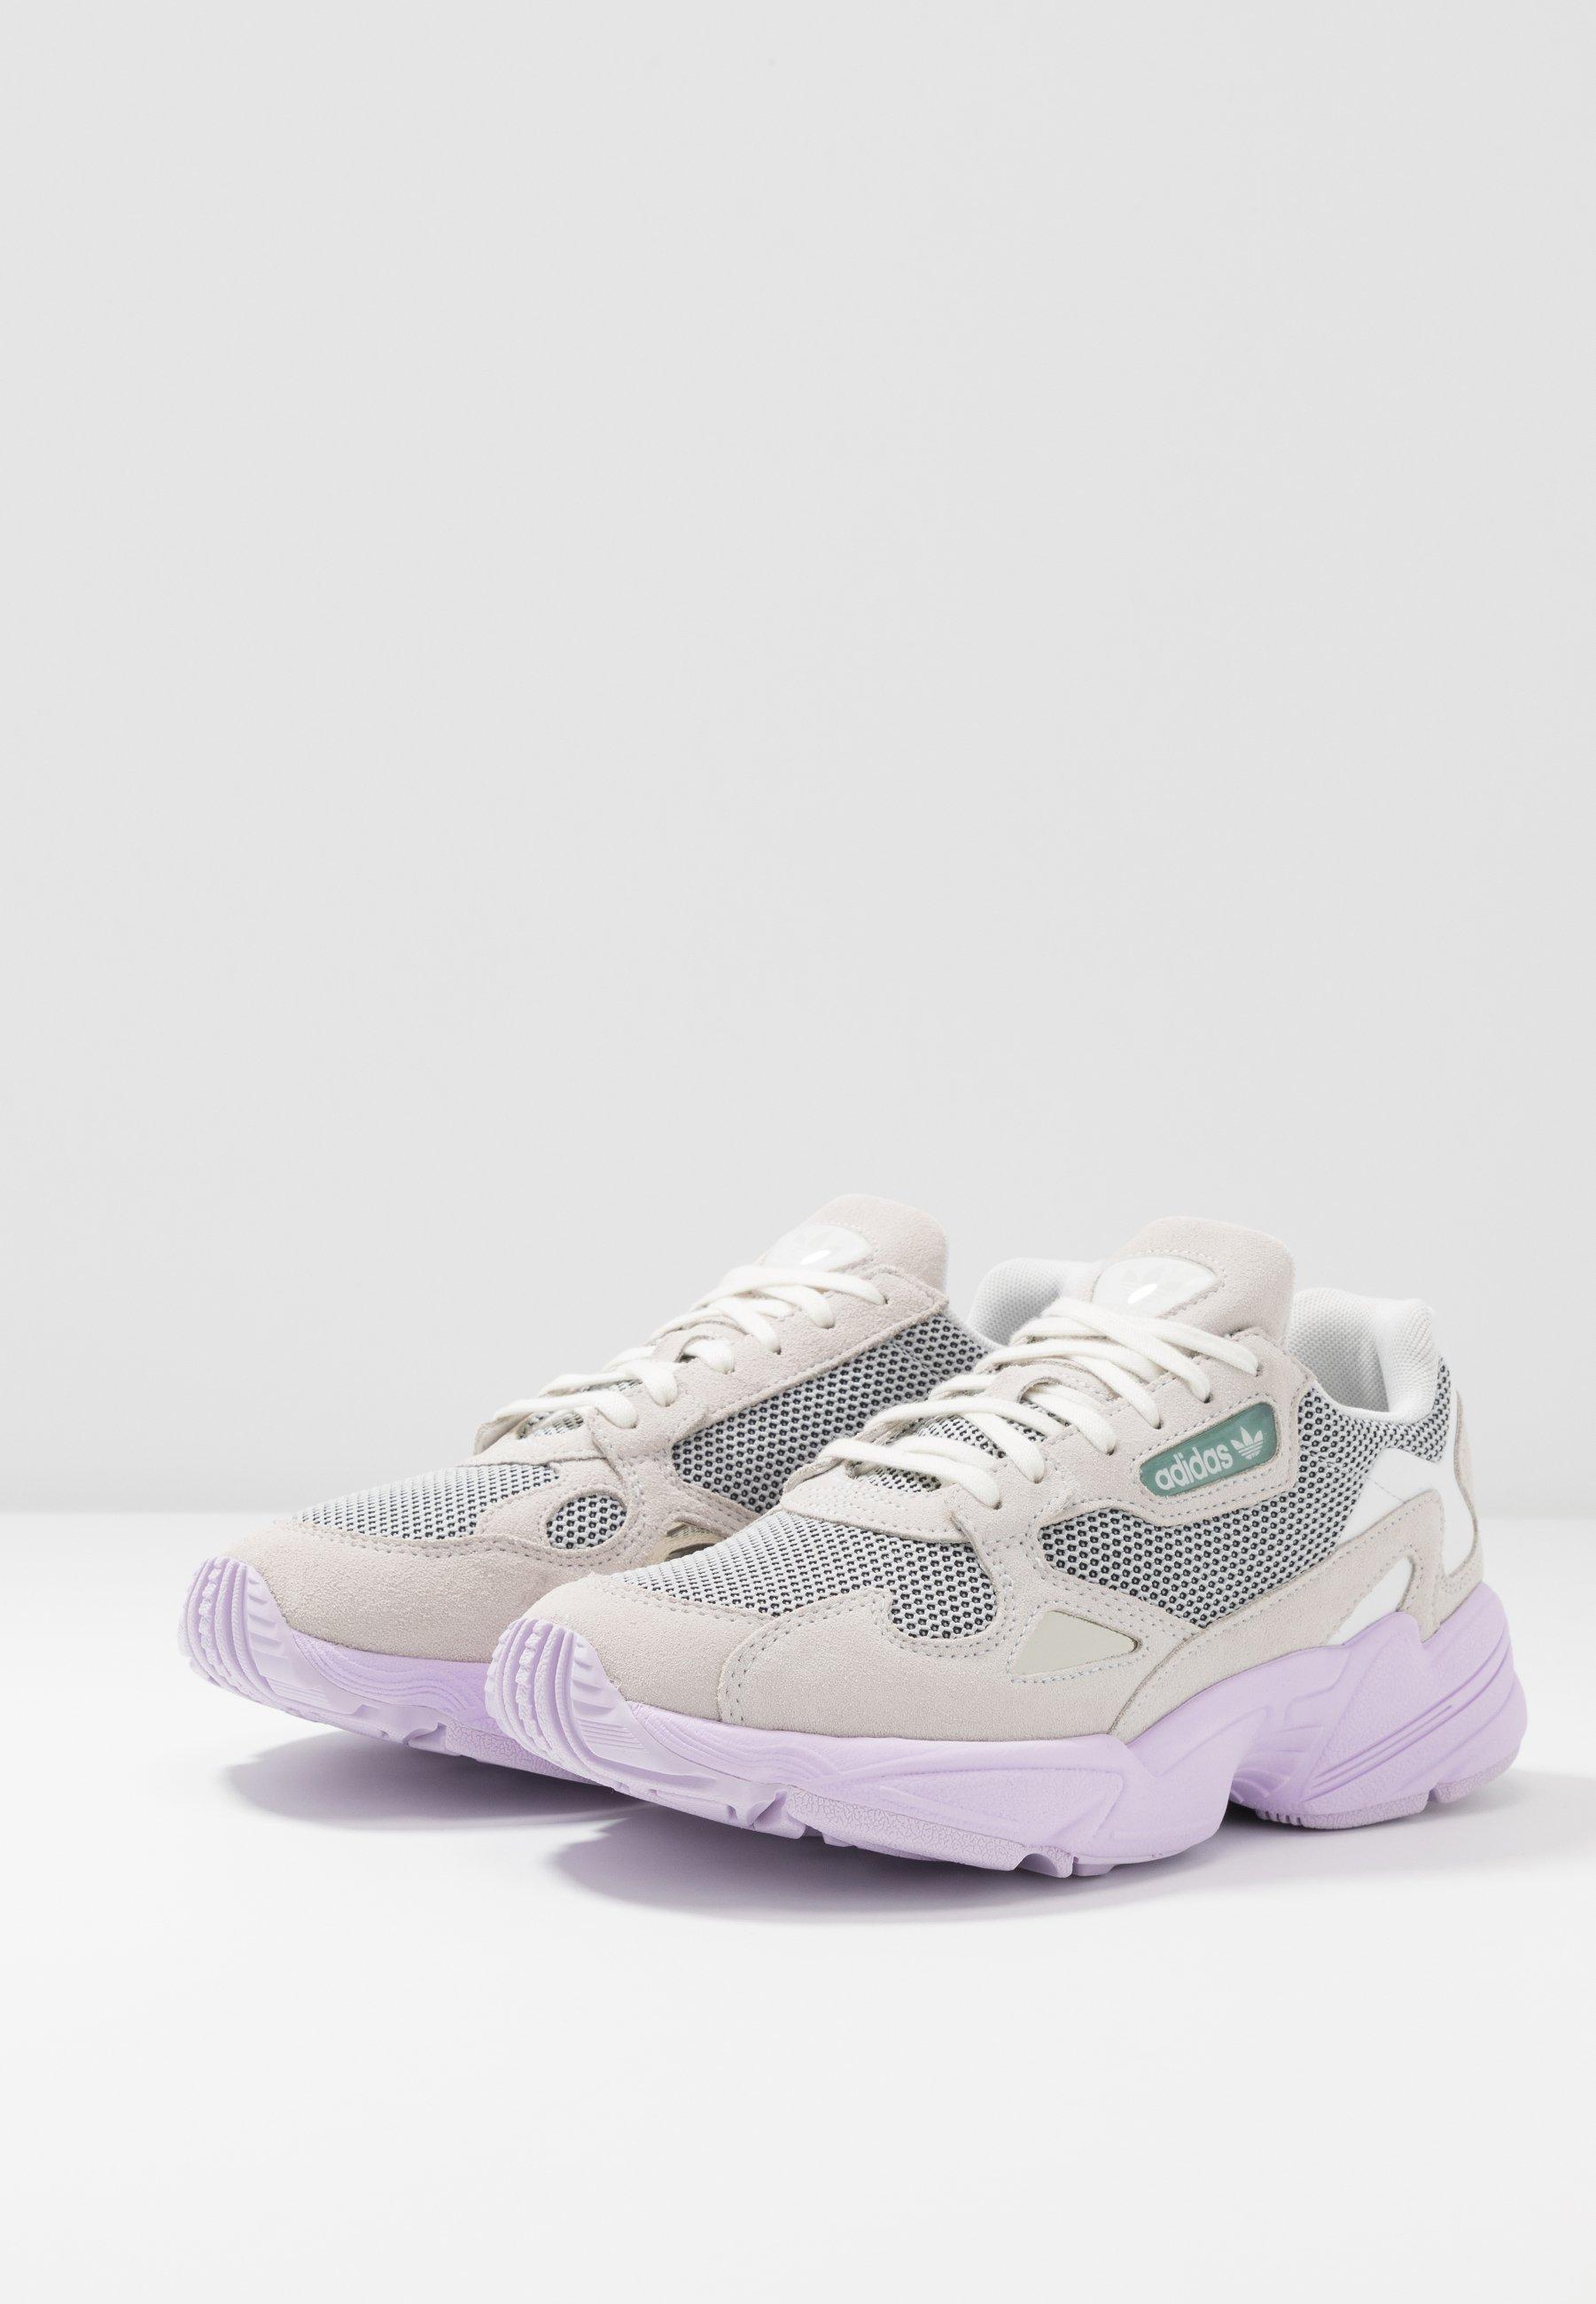 adidas Originals Sneaker low super color/chrystal white/footwear white/grau